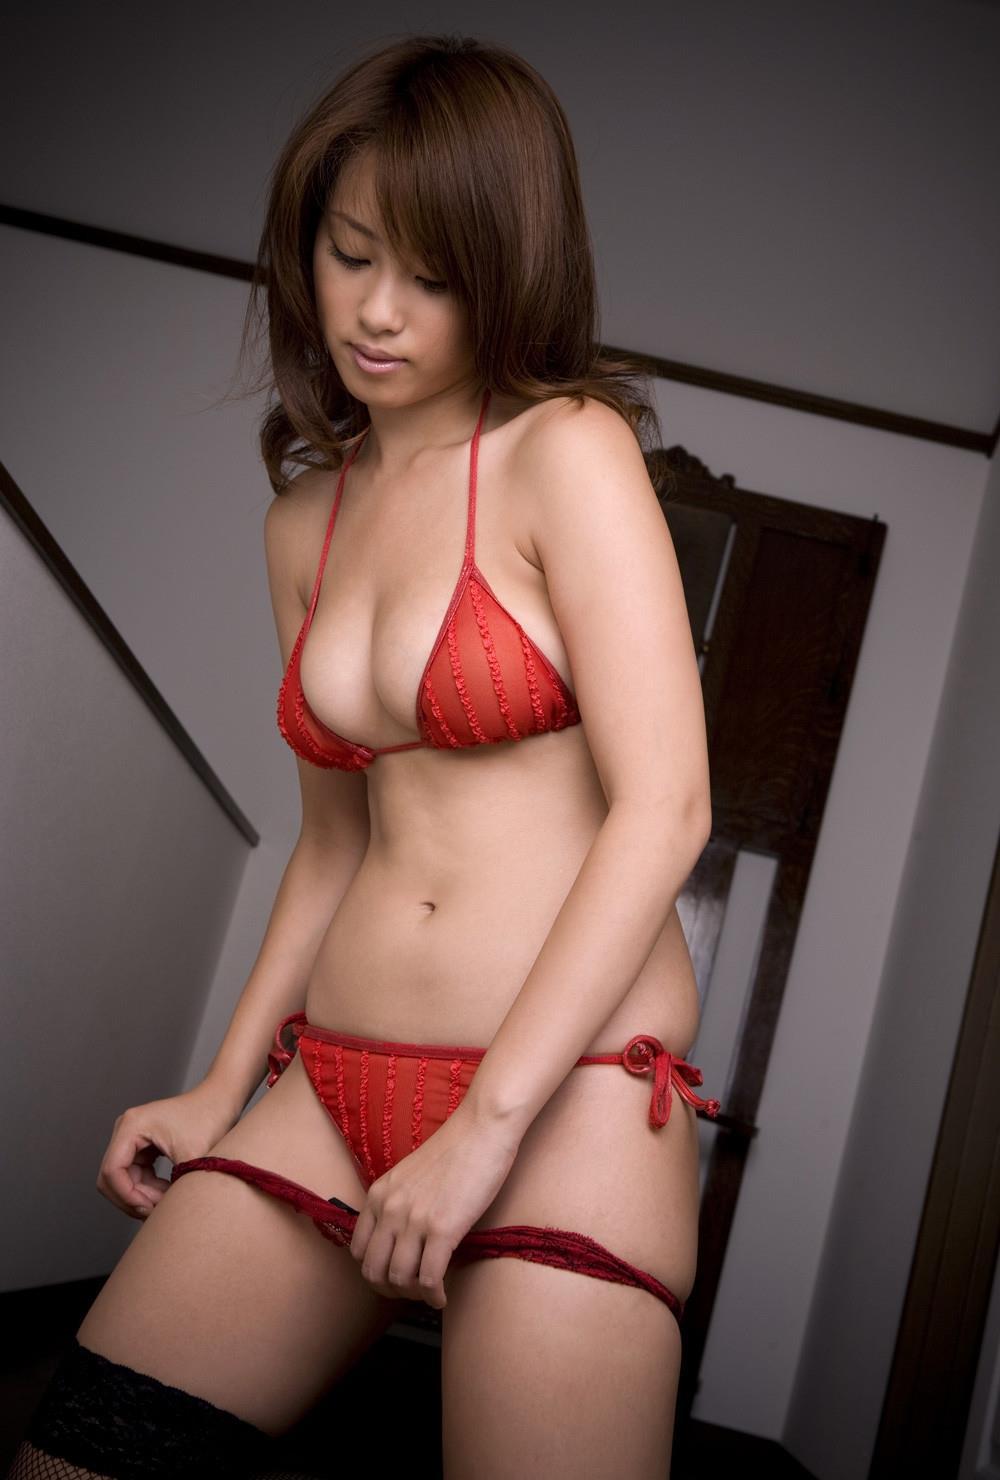 野田彩加 エロ画像 47